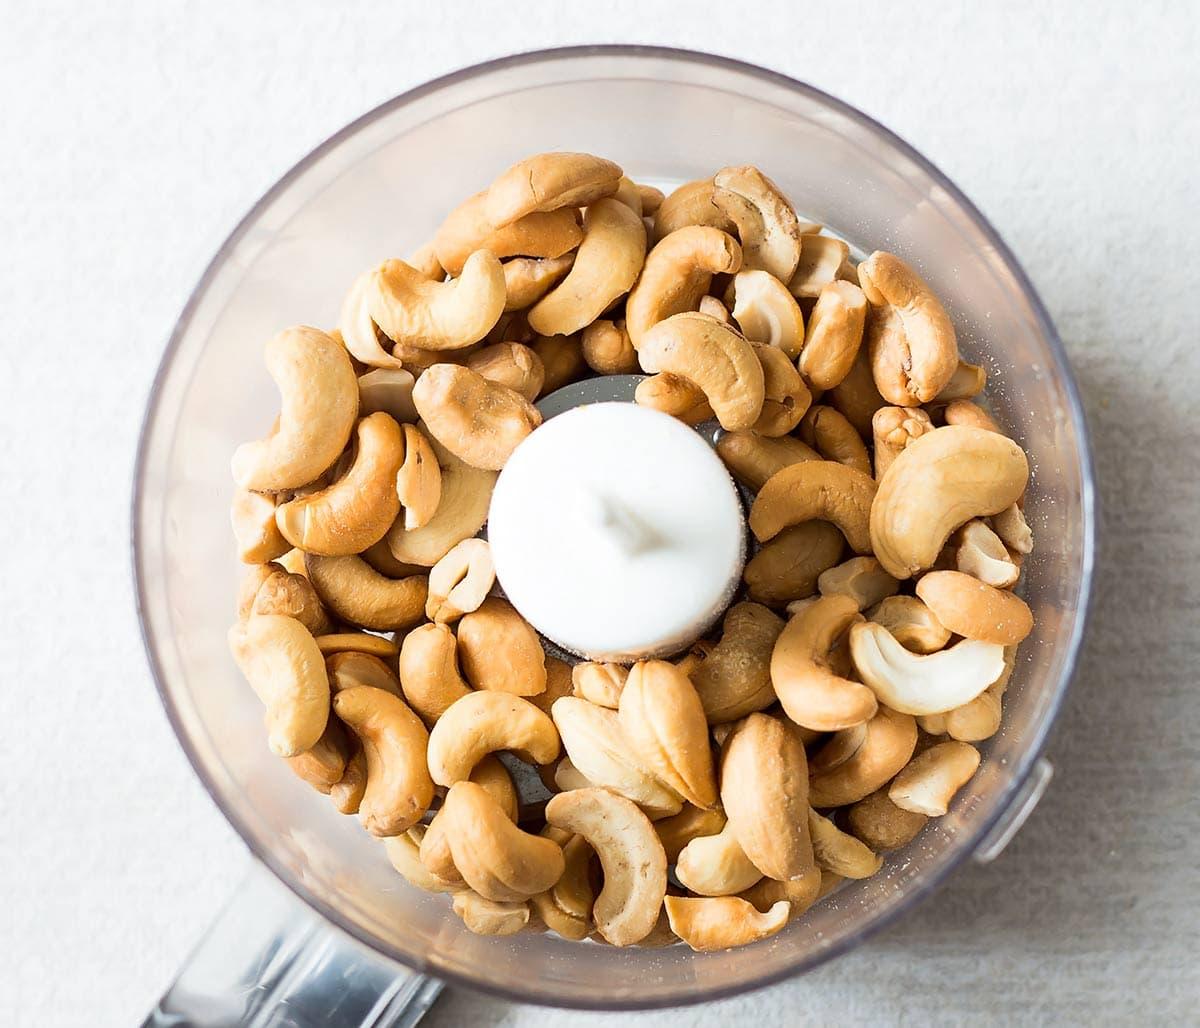 Roasted cashews in food processor